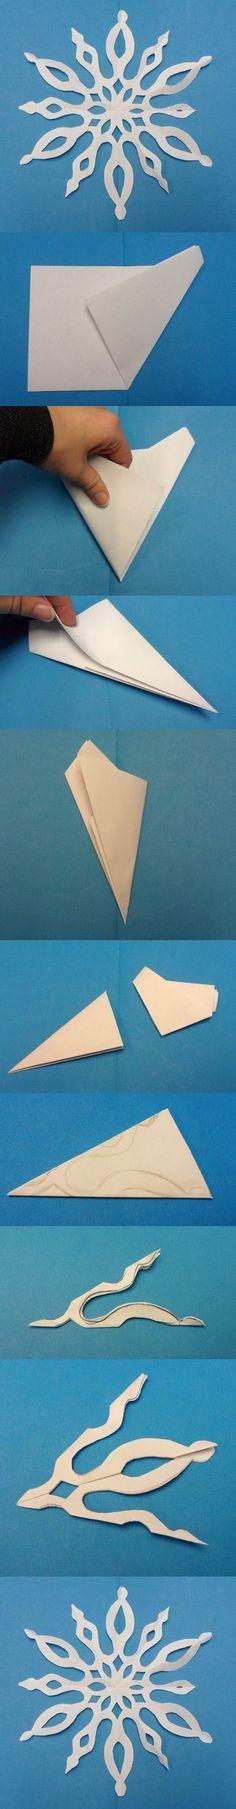 DIY Easy Paper Cut Snowflake | iCreativeIdeas.com Like Us on Facebook ==> https://www.facebook.com/icreativeideas